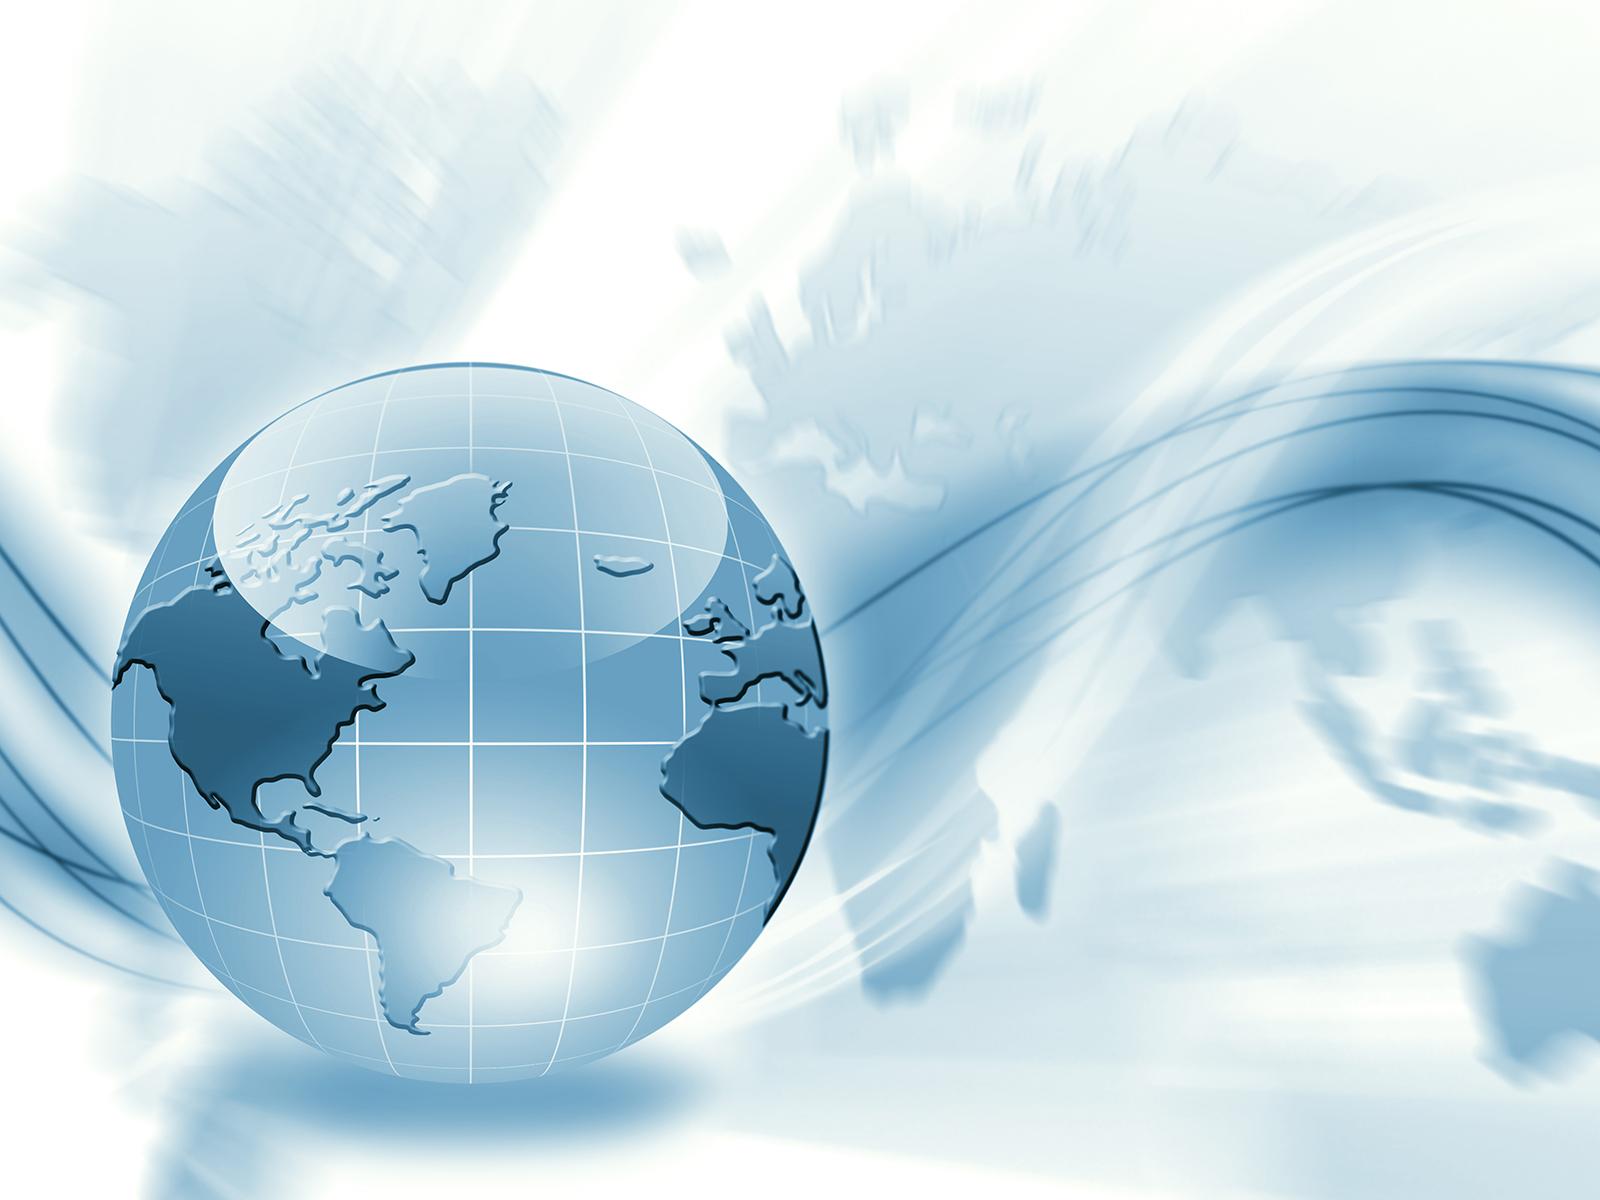 3D Global World